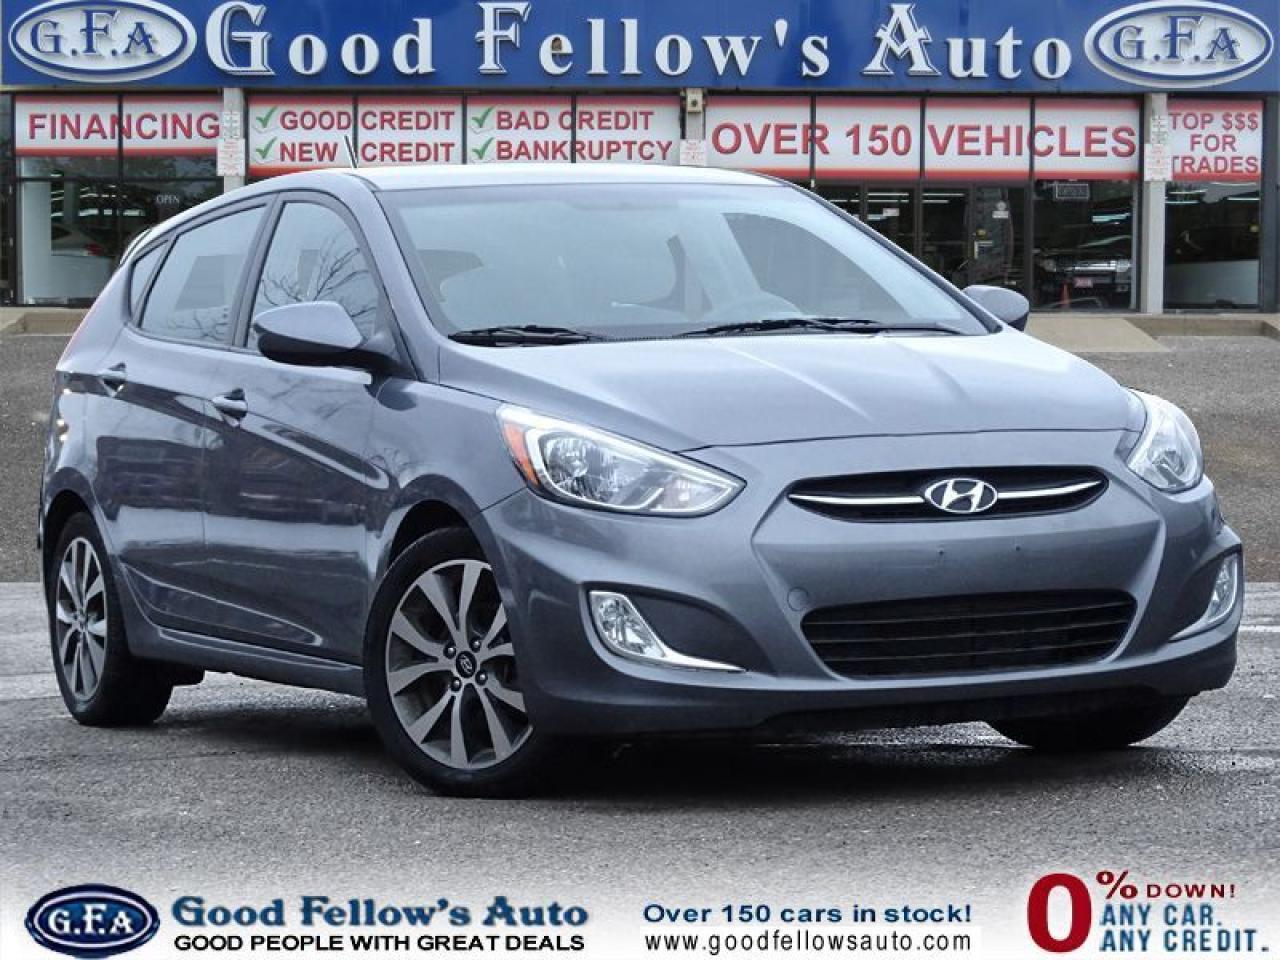 2017 Hyundai Accent SE MODEL, SUNROOF